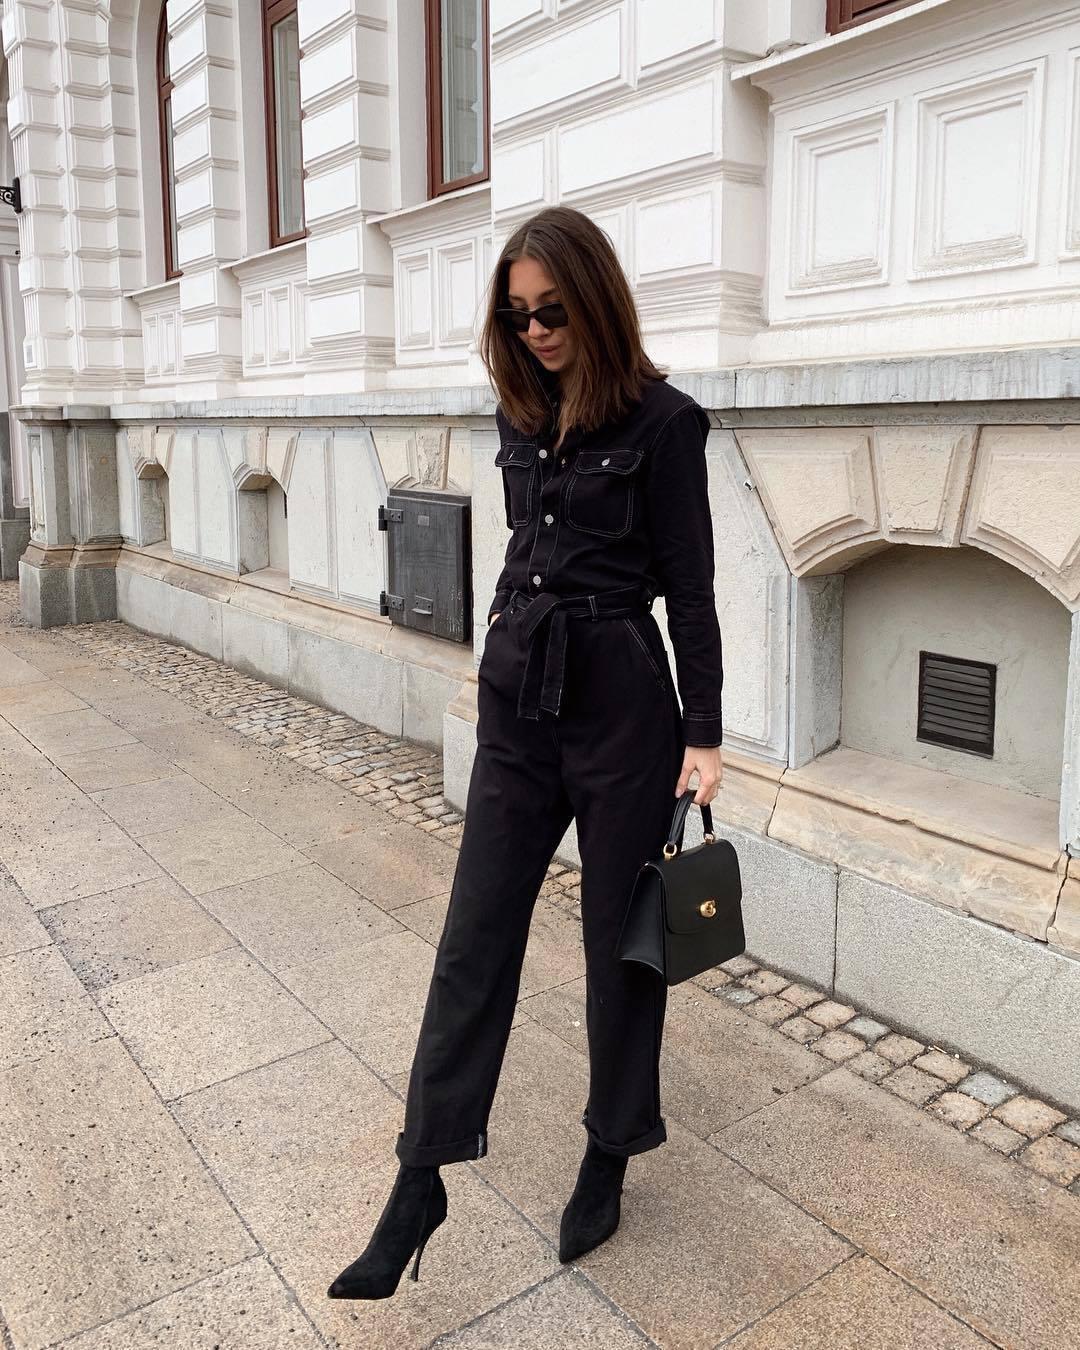 jumpsuit black jumpsuit long sleeves black boots sock boots black bag handbag